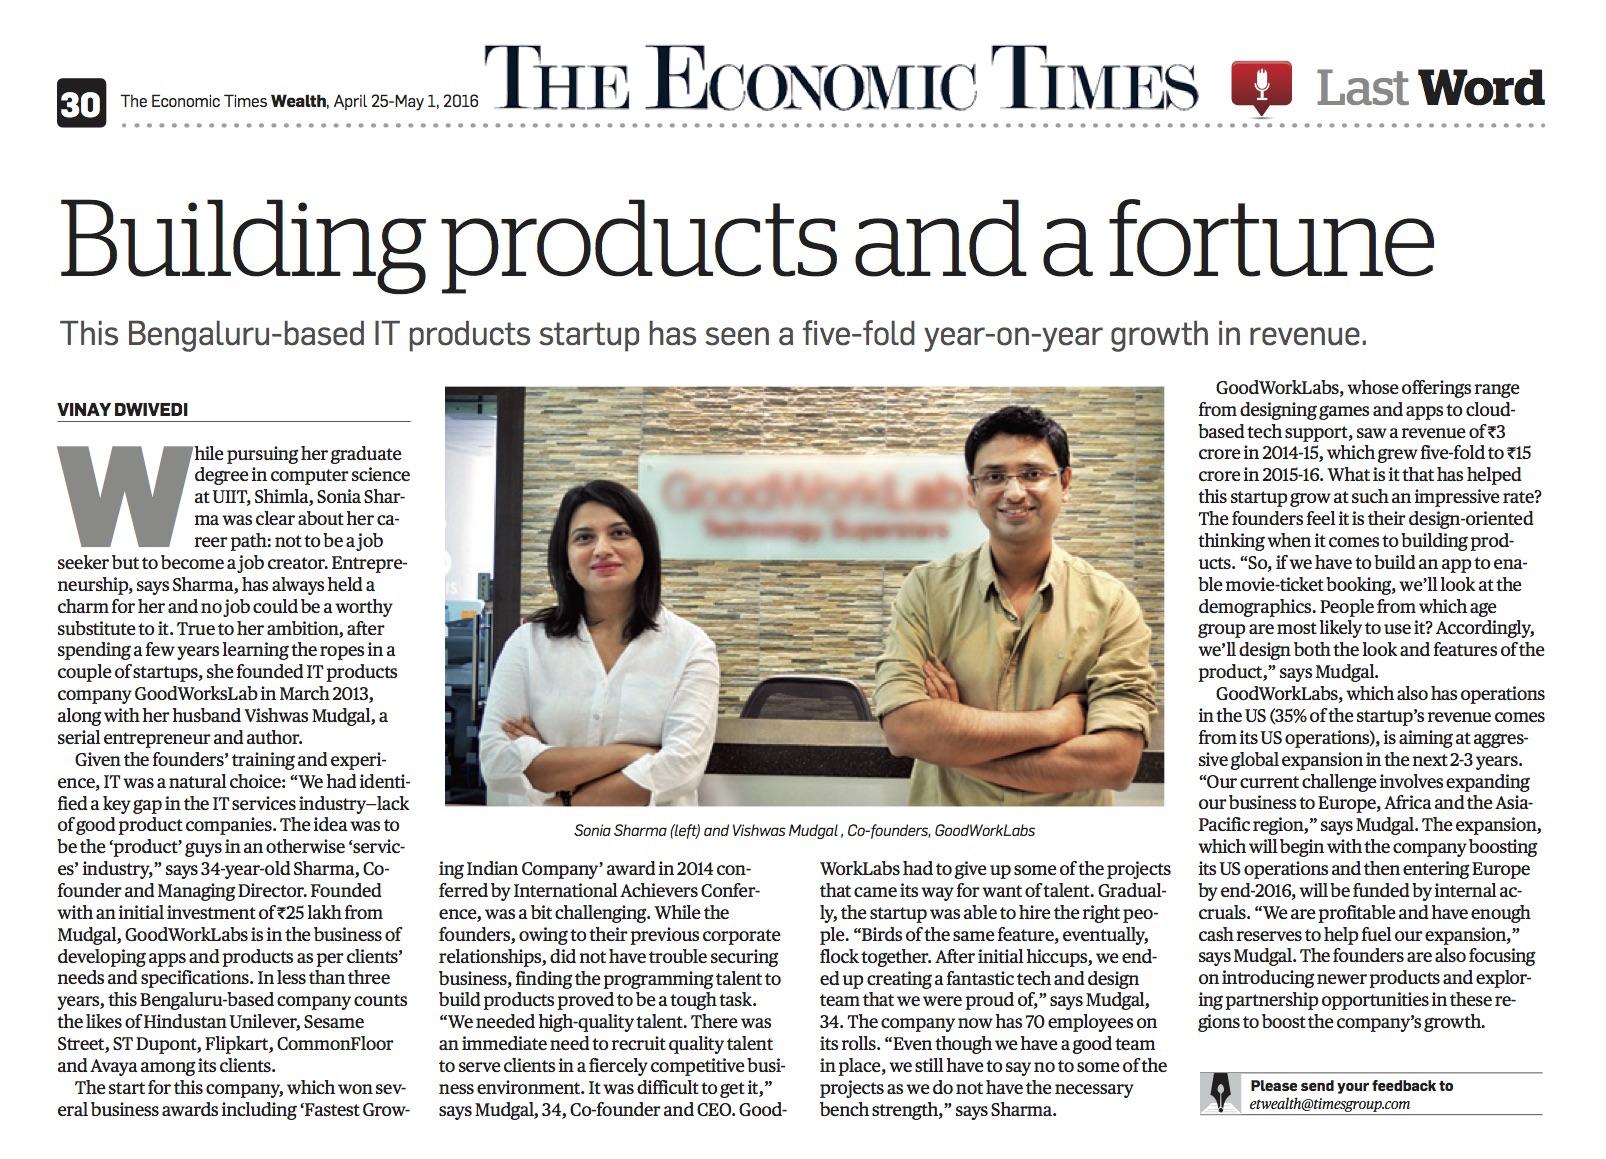 economic-times-how-goodworklabs-grew-five-times-revenue